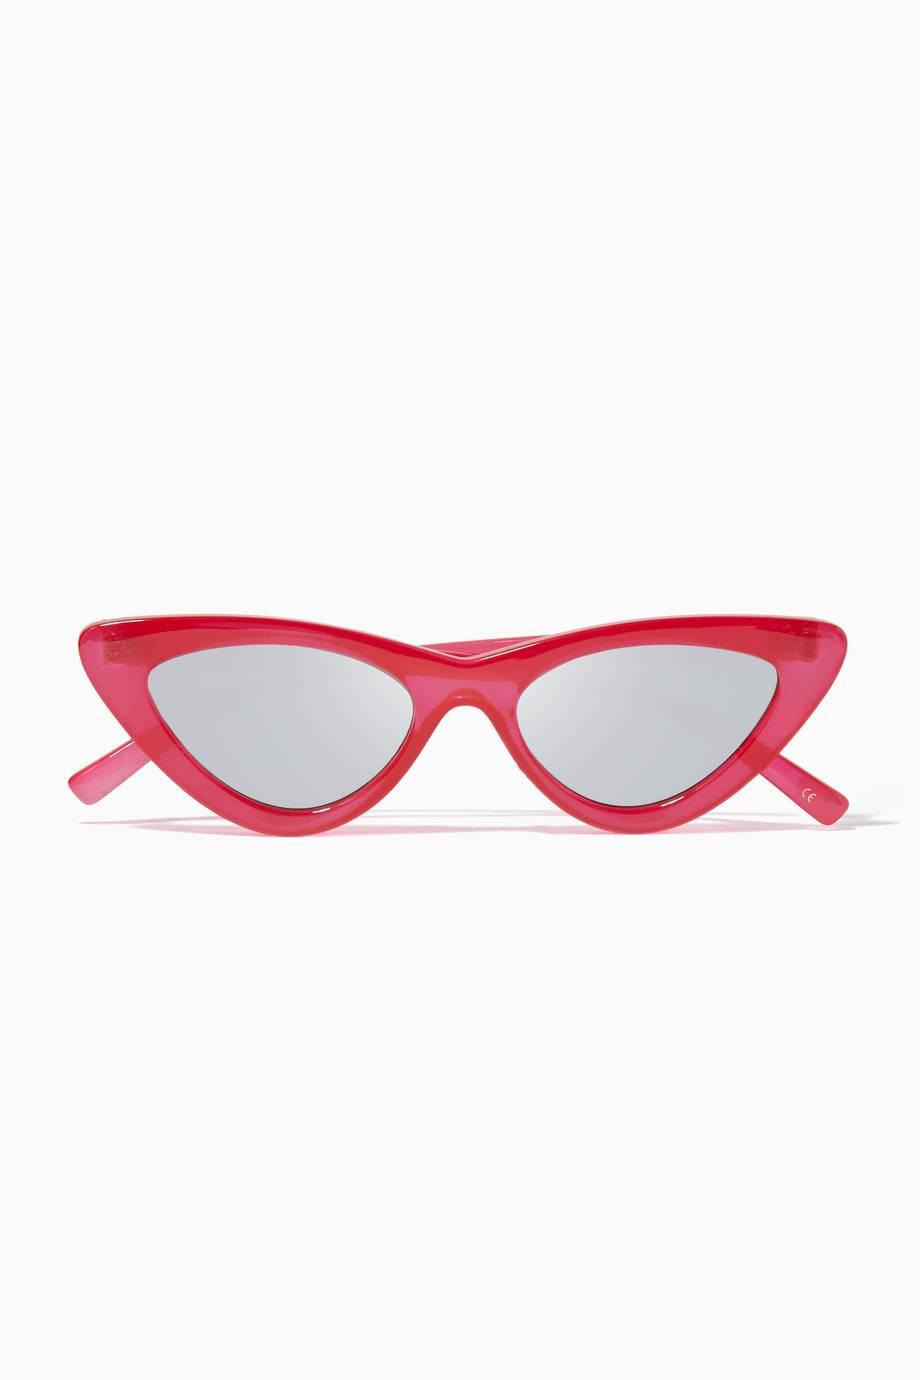 1246a74814 Shop Luxury Le Specs Red The Last Lolita Sunglasses